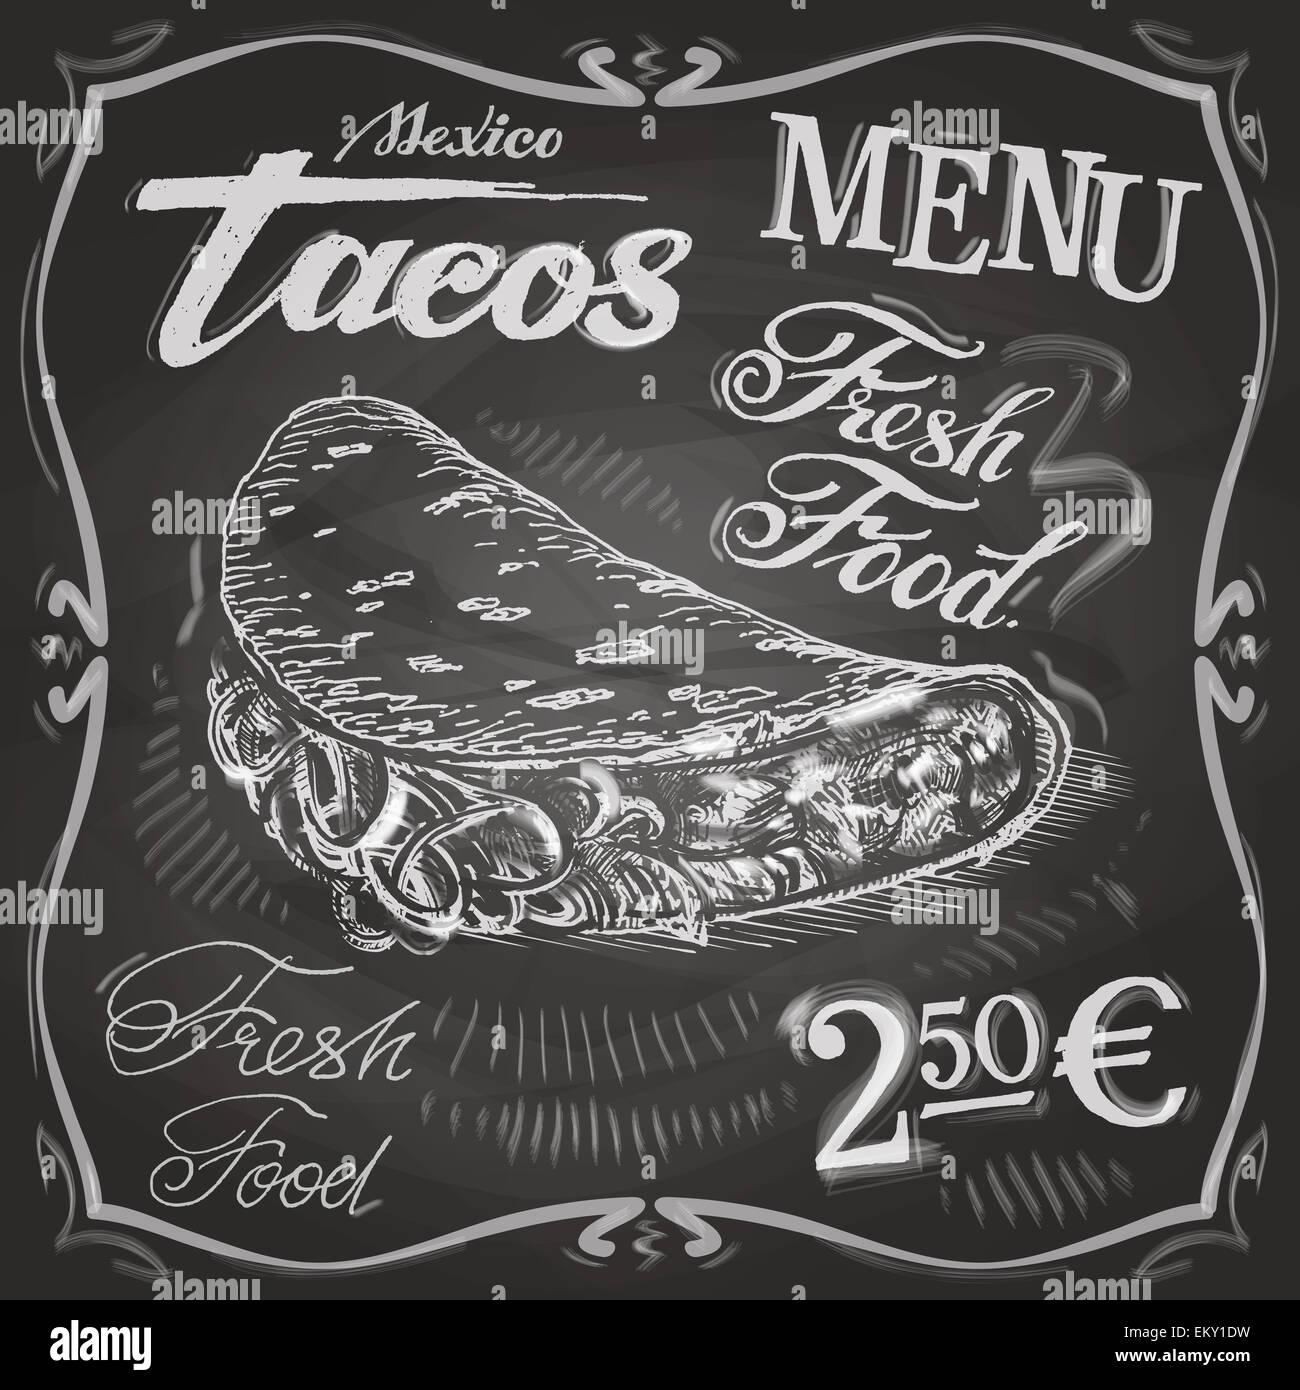 burritos tacos vector logo design template fast food or menu board